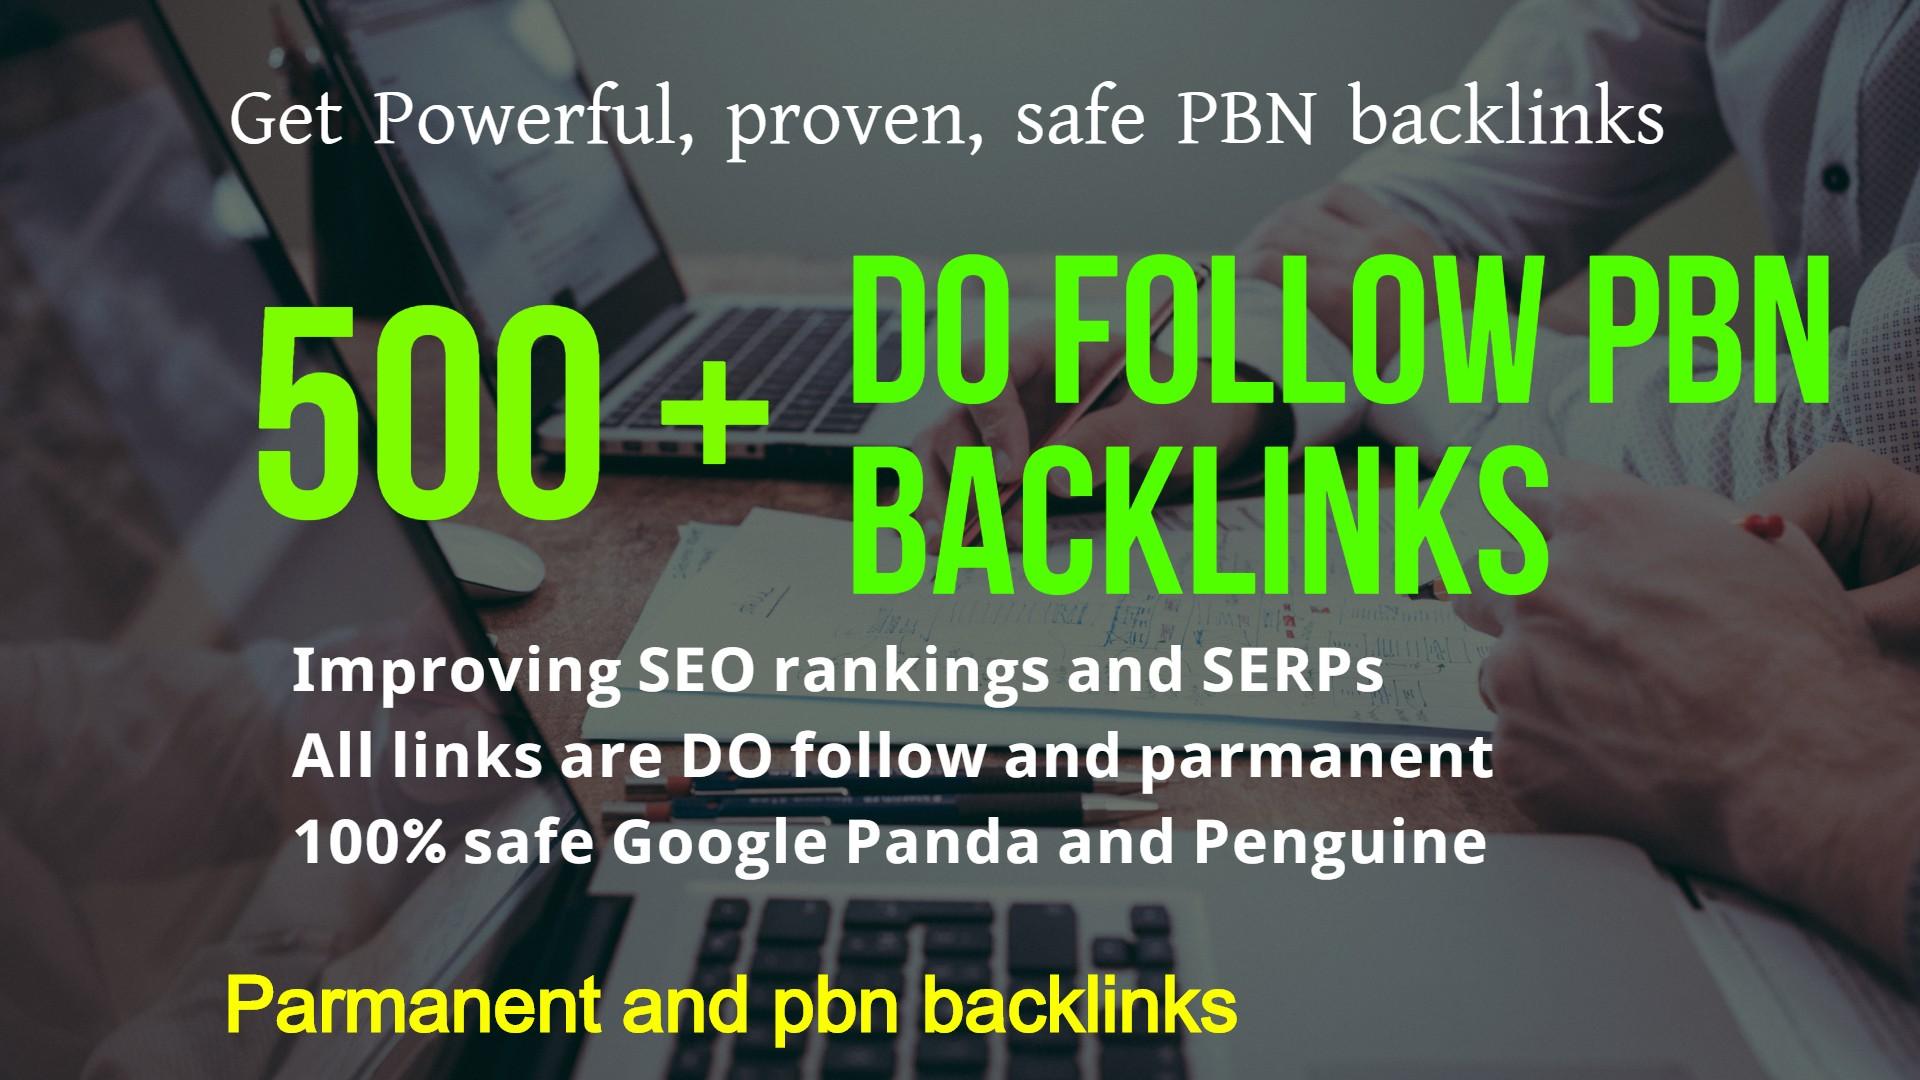 Get 500+ high Quality PBN baclinks HIGH DA PA TC TF. GET IT NOW